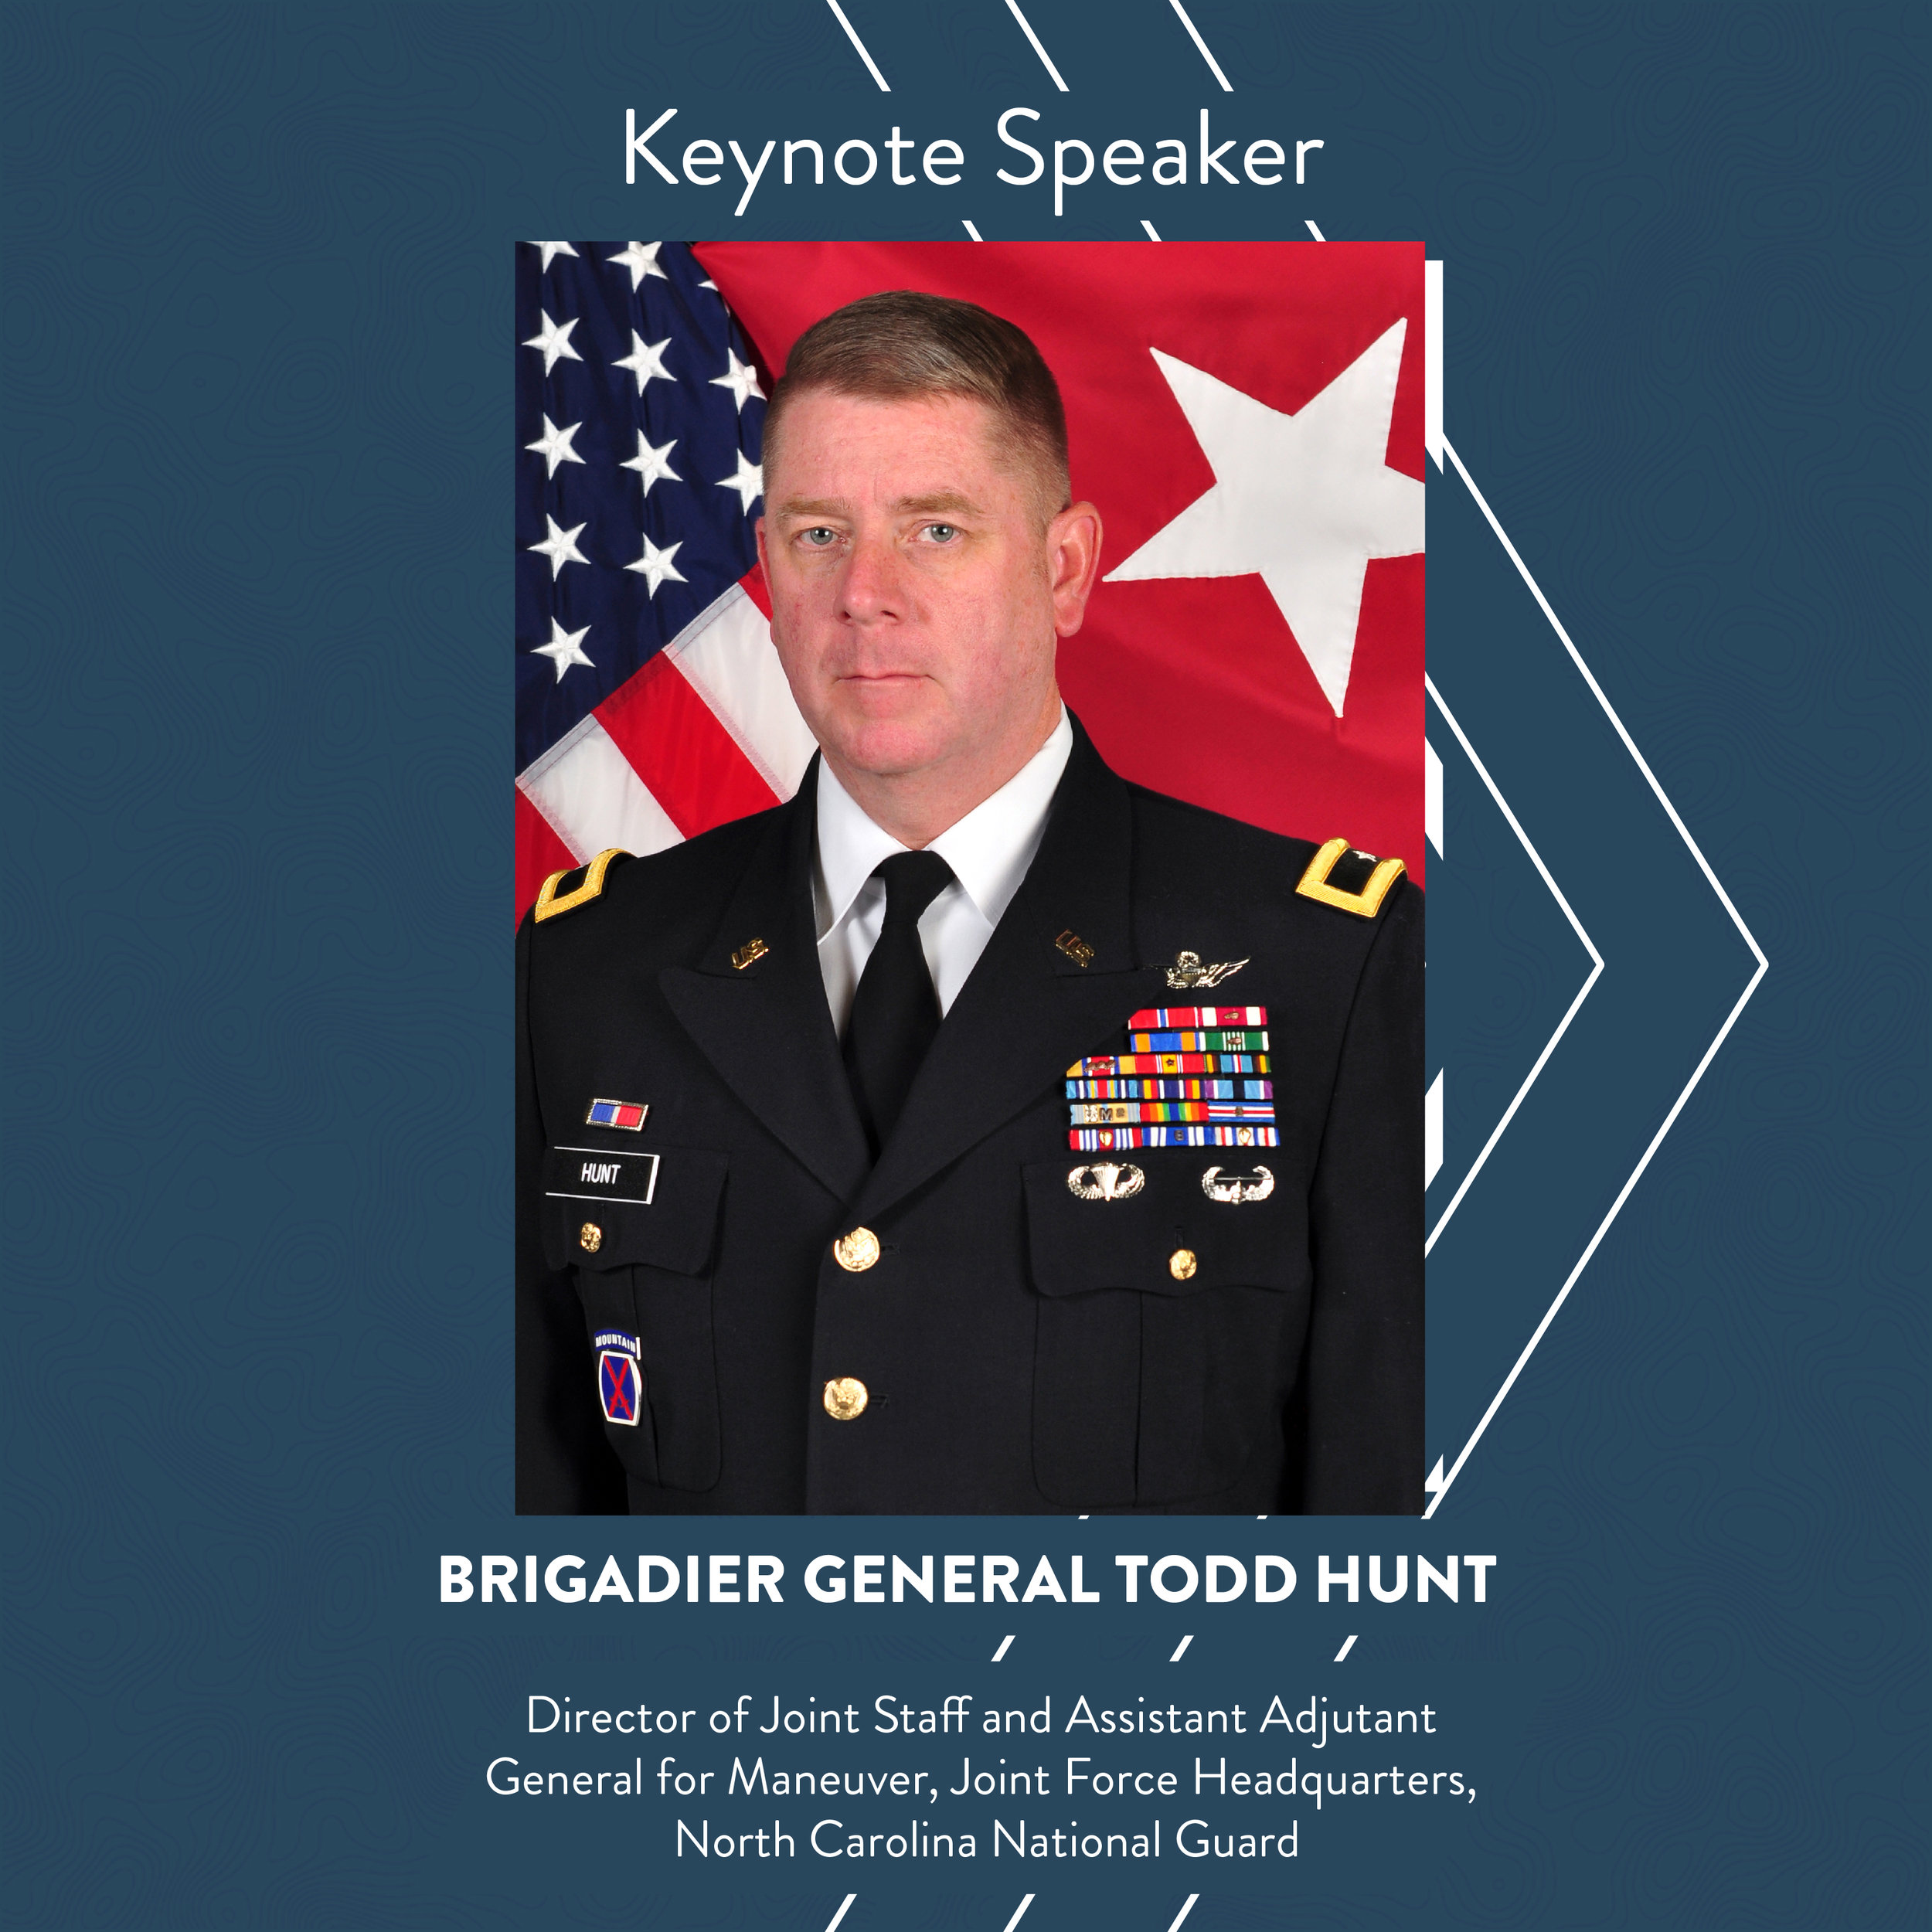 Brigadier_General_Todd_Hunt.jpg